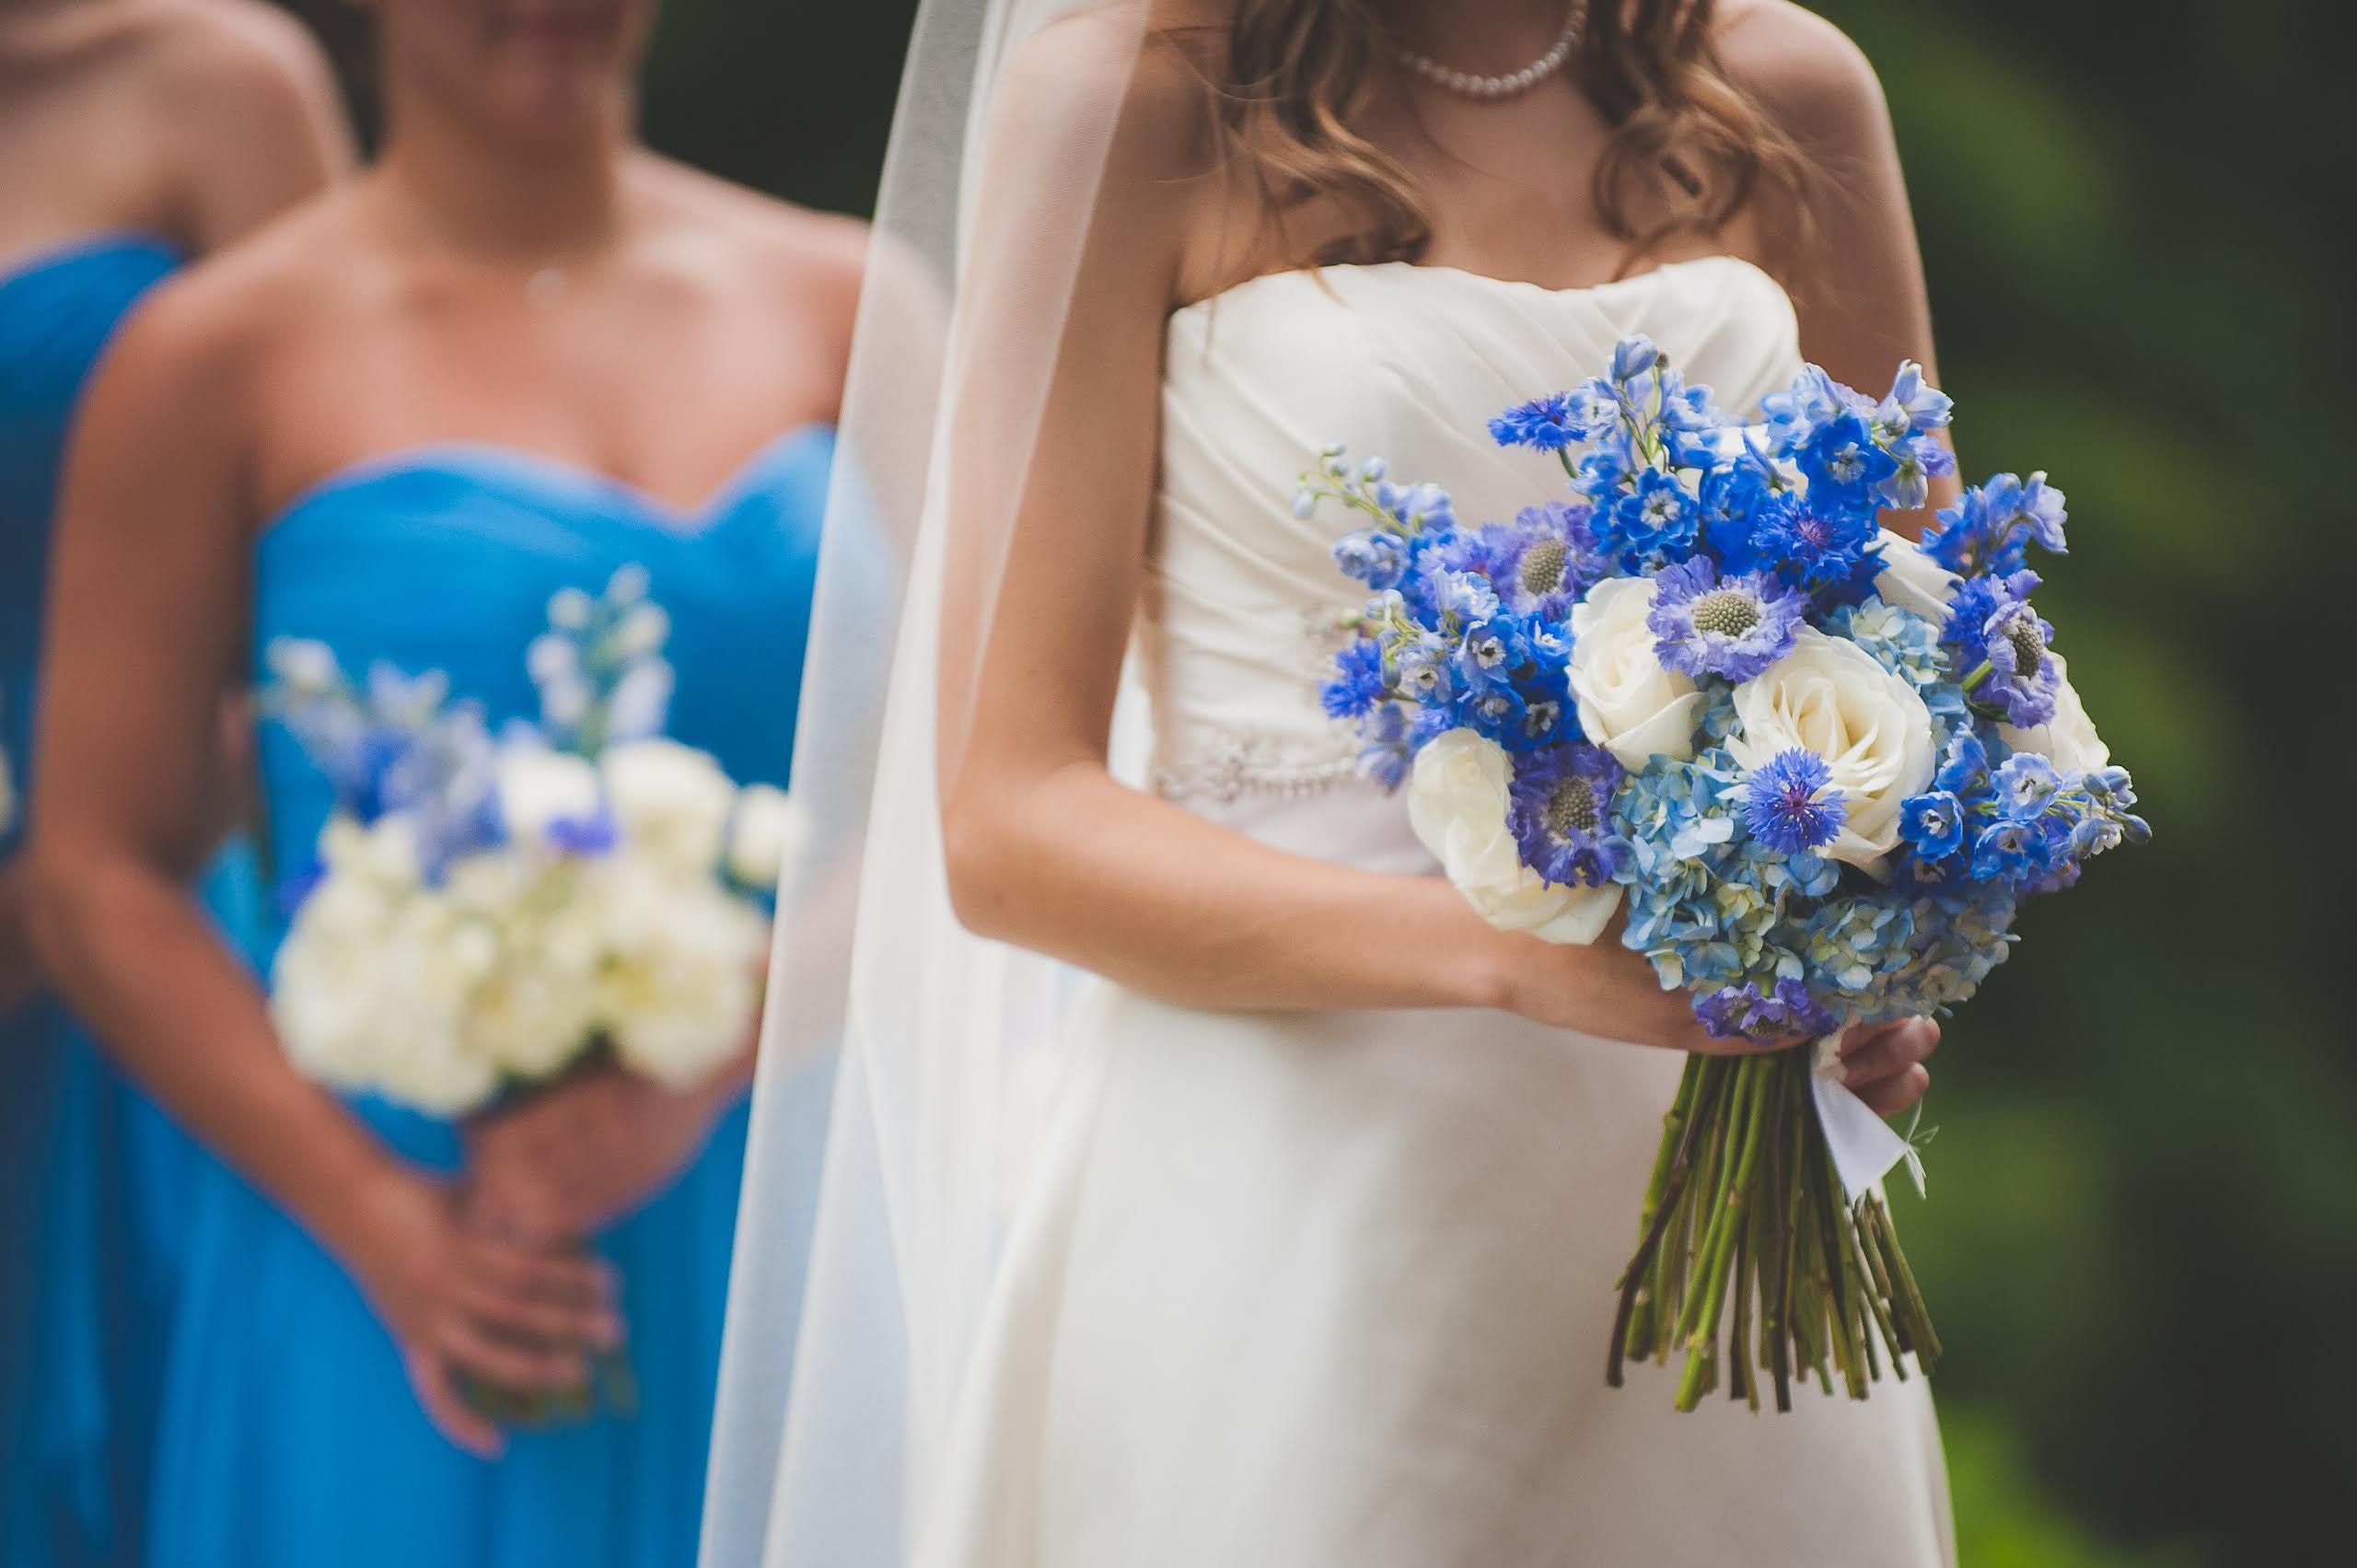 8 Jpg 2560 1703 Blue Wedding Decorations Cornflower Blue Wedding Blue Wedding Bouquet